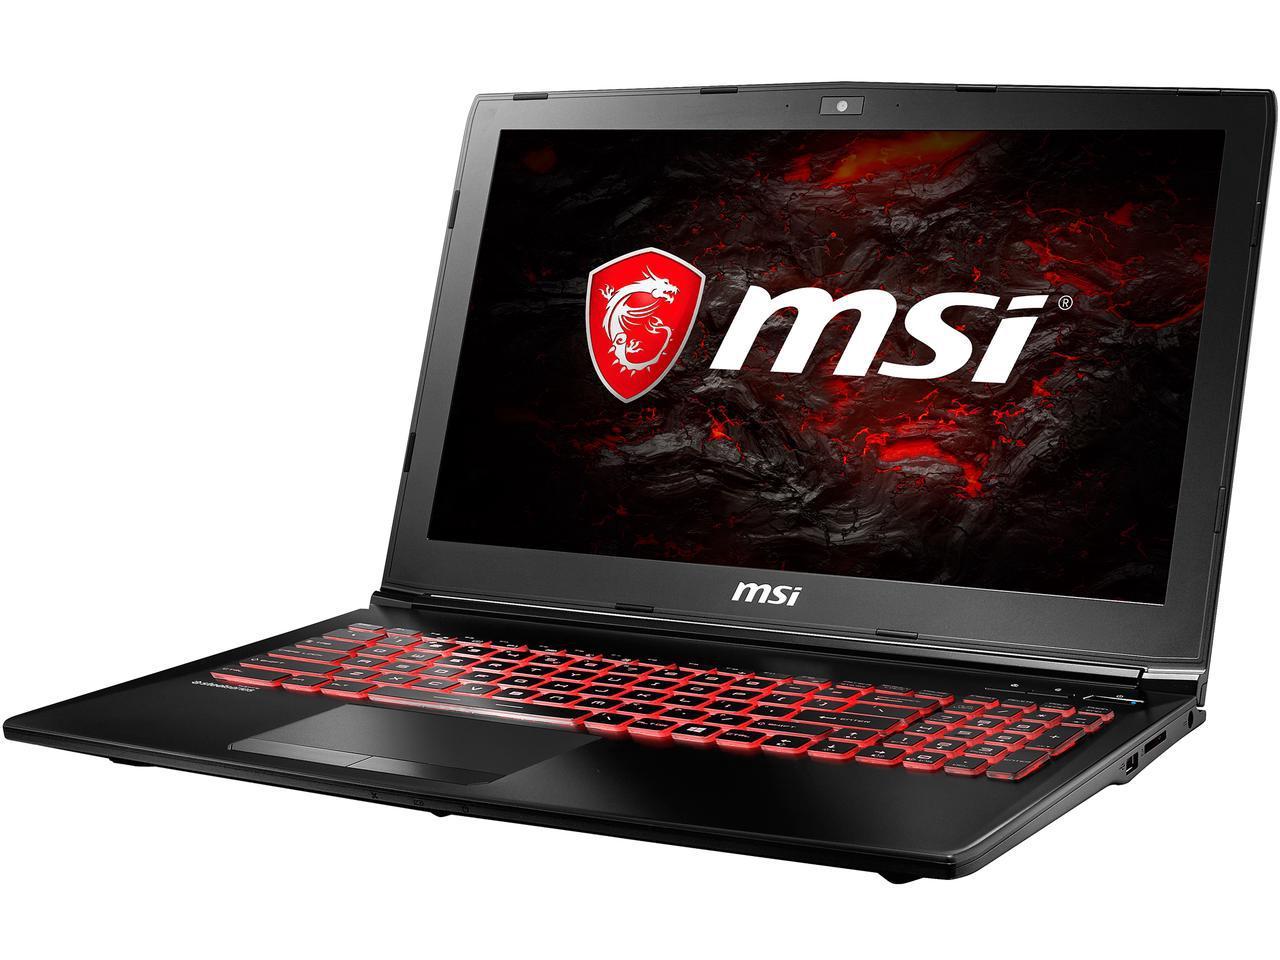 MSI GL62M Gaming Laptop: 15.6'' FHD, i5-7300HQ, 8GB DDR4, 1TB HDD, GTX 1050 2GB, Type-C, Win10 @ $574 AR + F/S